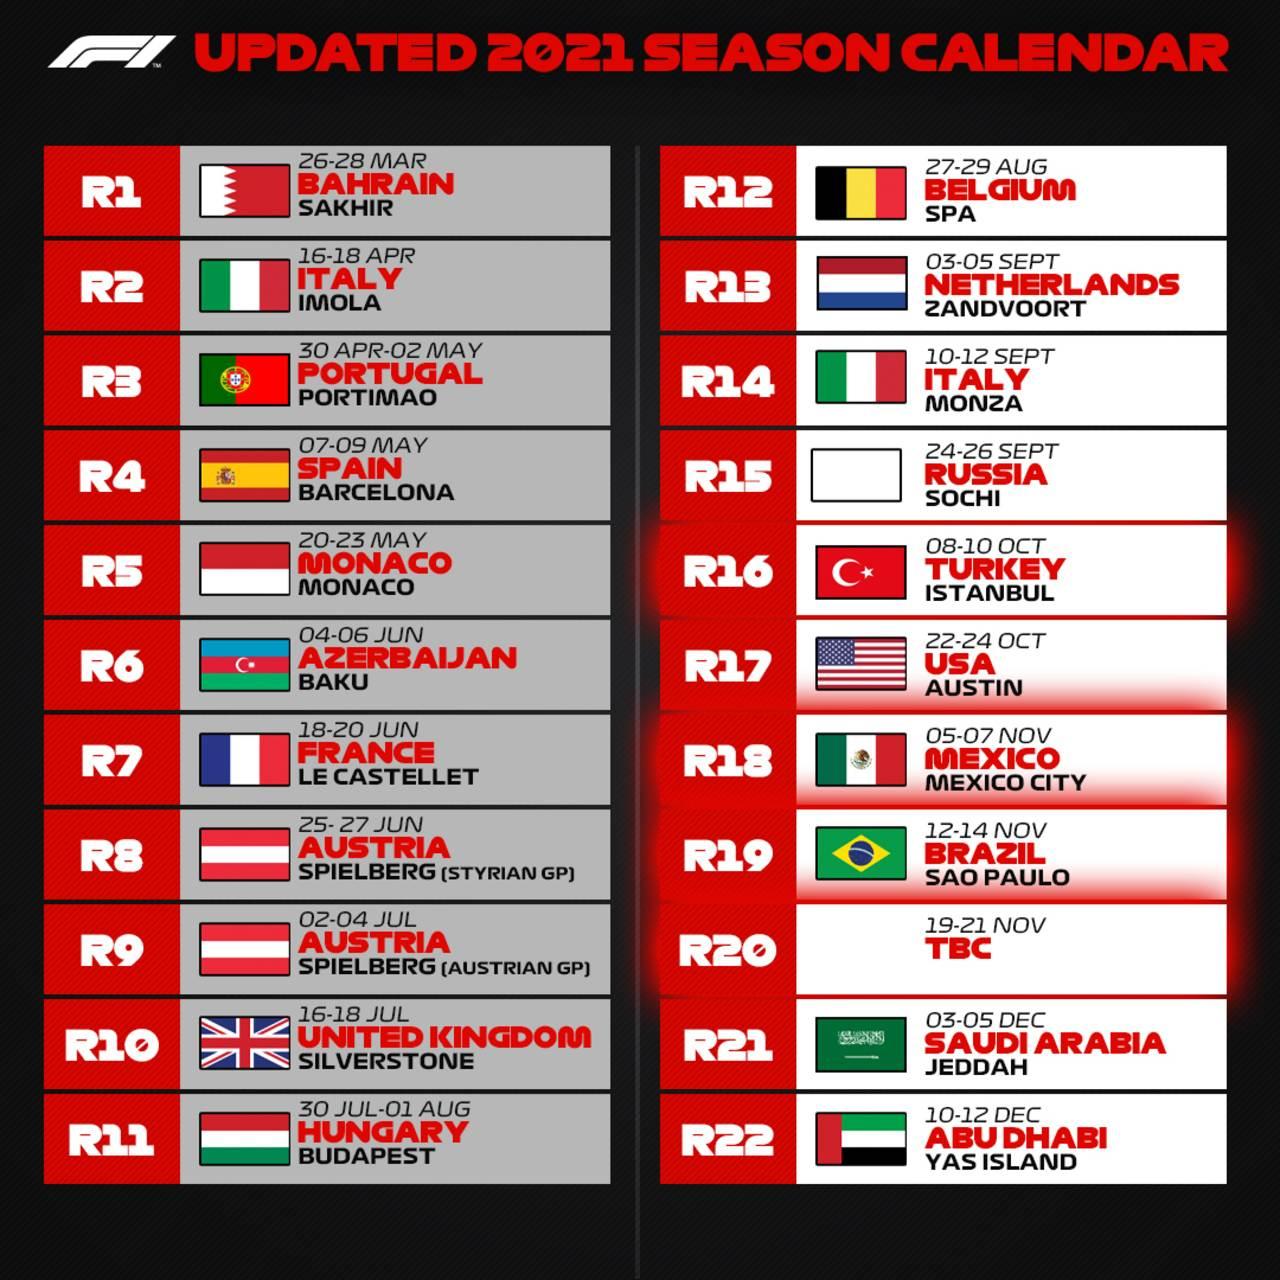 Fórmula 1 hoy gp de méxico cambio de fecha